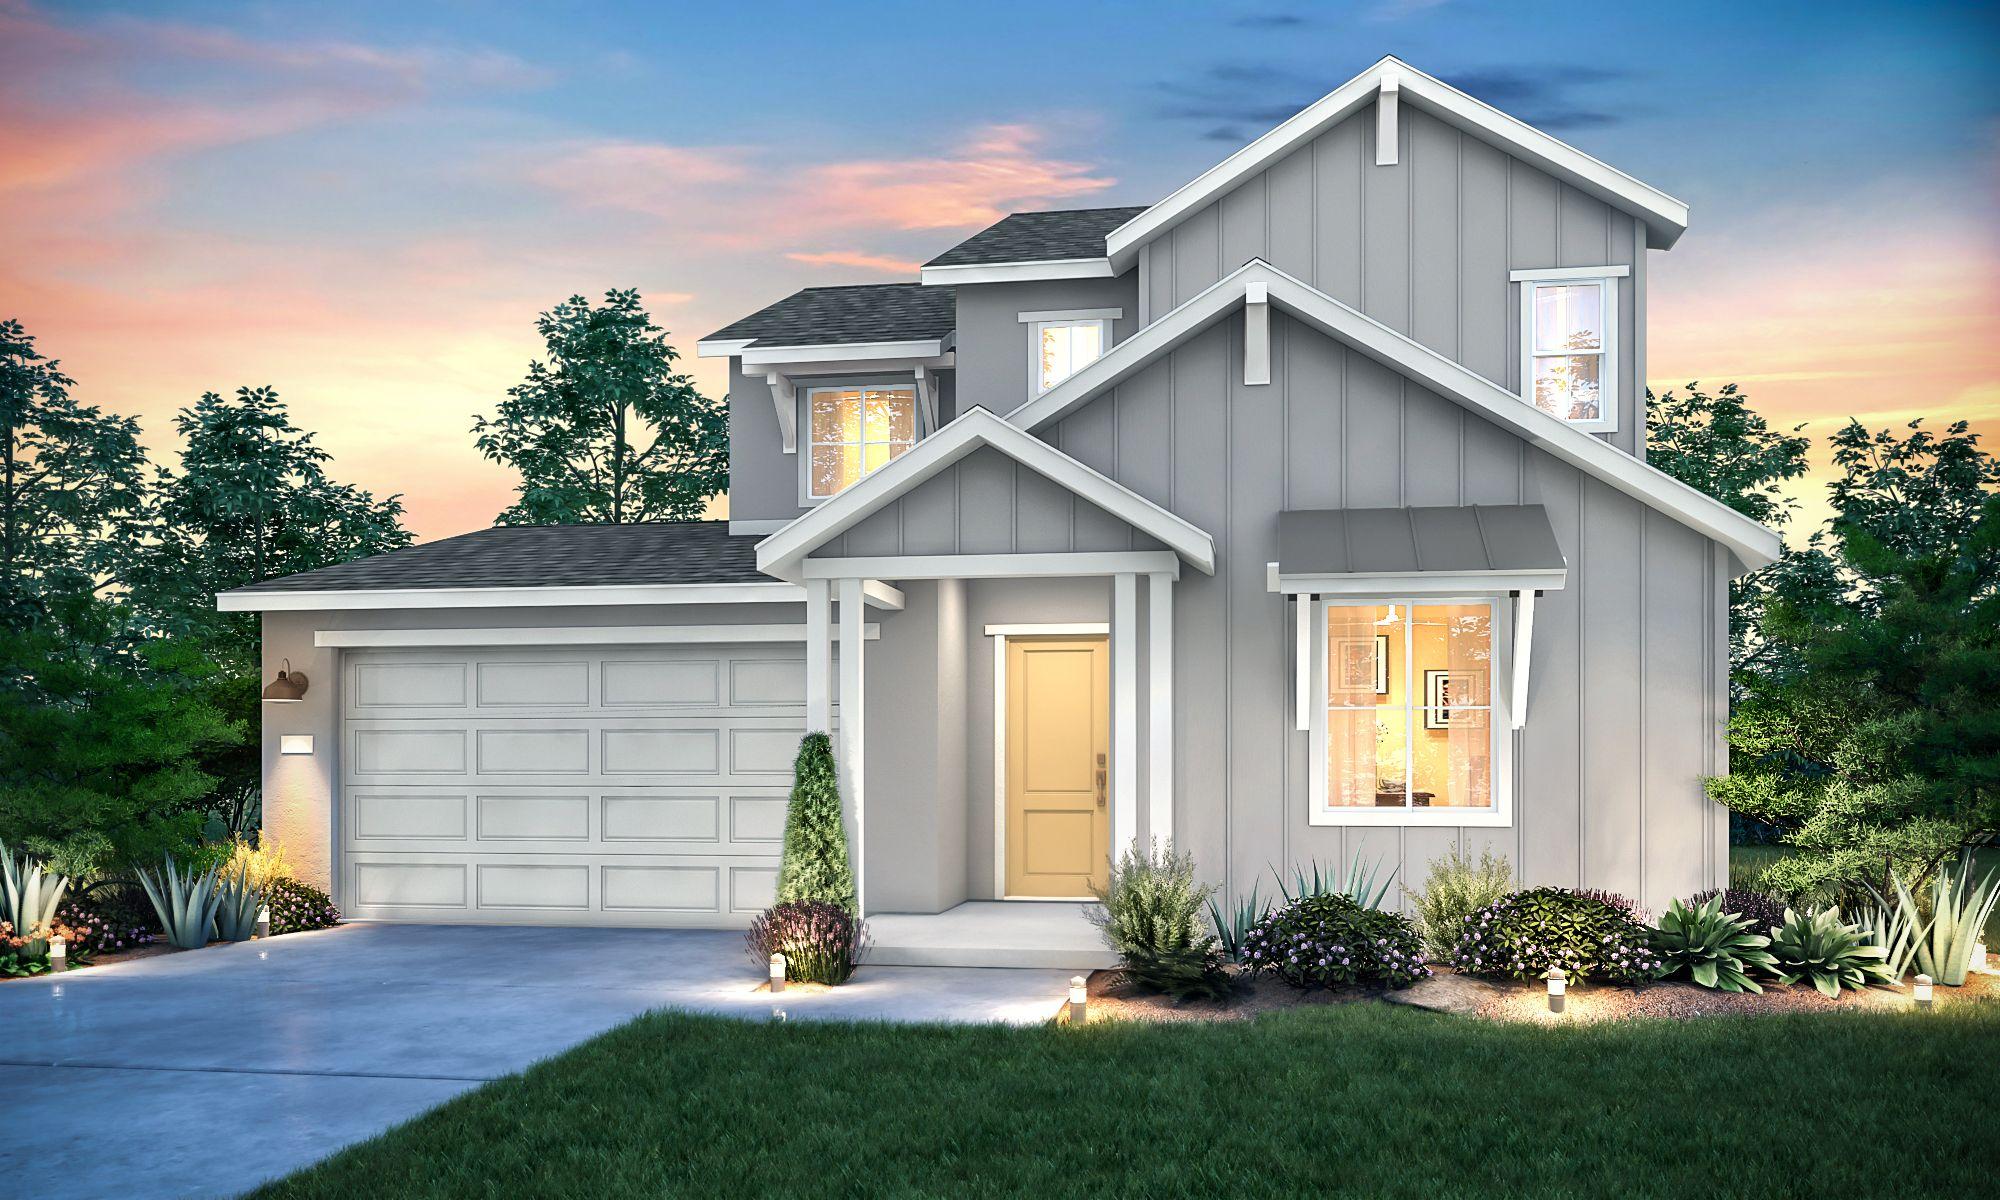 'Bristol' by Signature Homes - CA in Santa Rosa